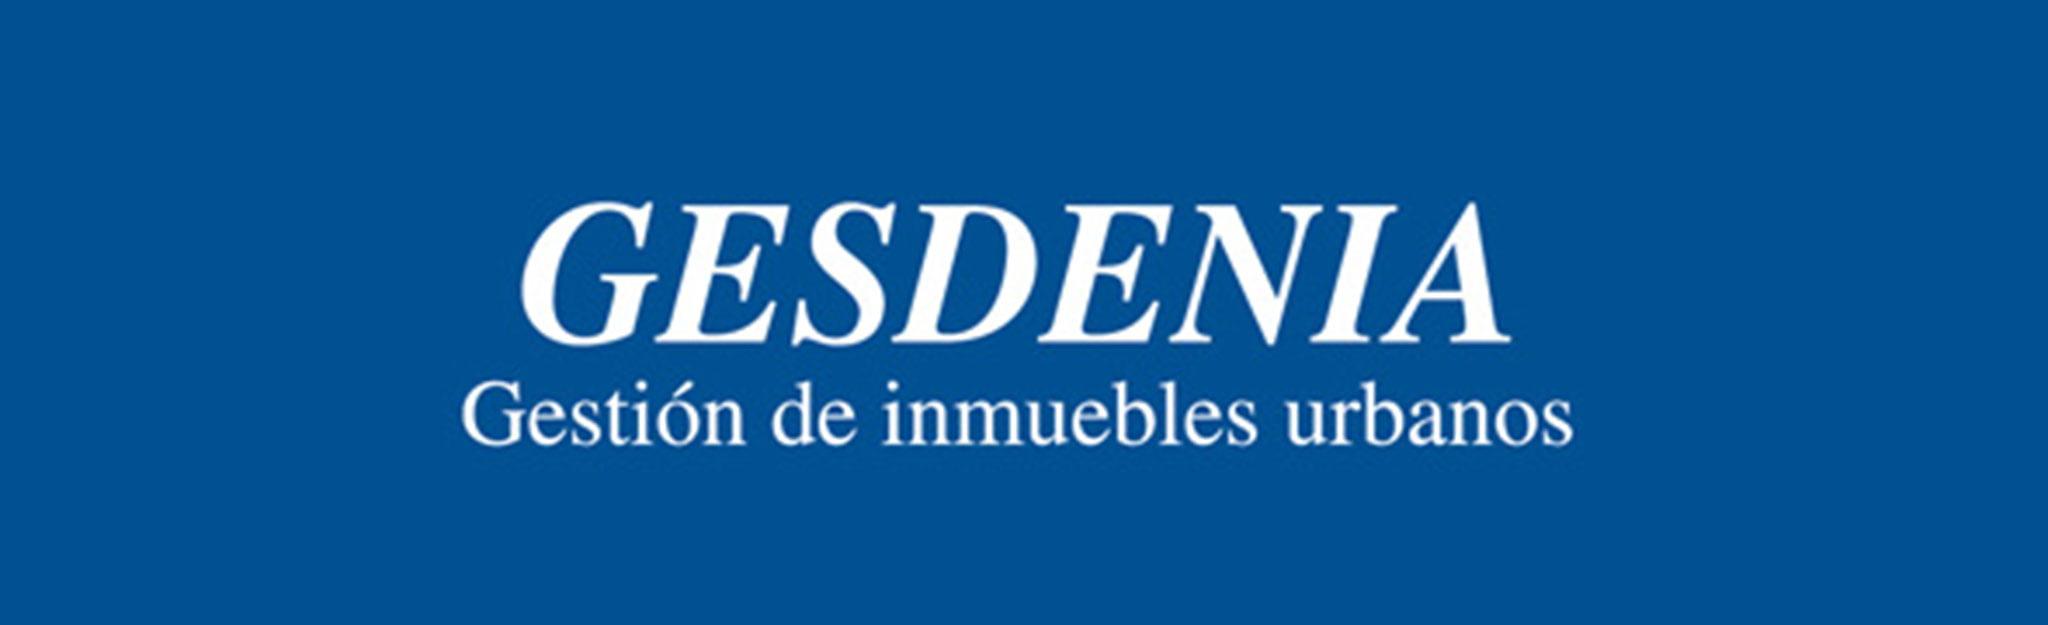 Logotipo Gesdenia